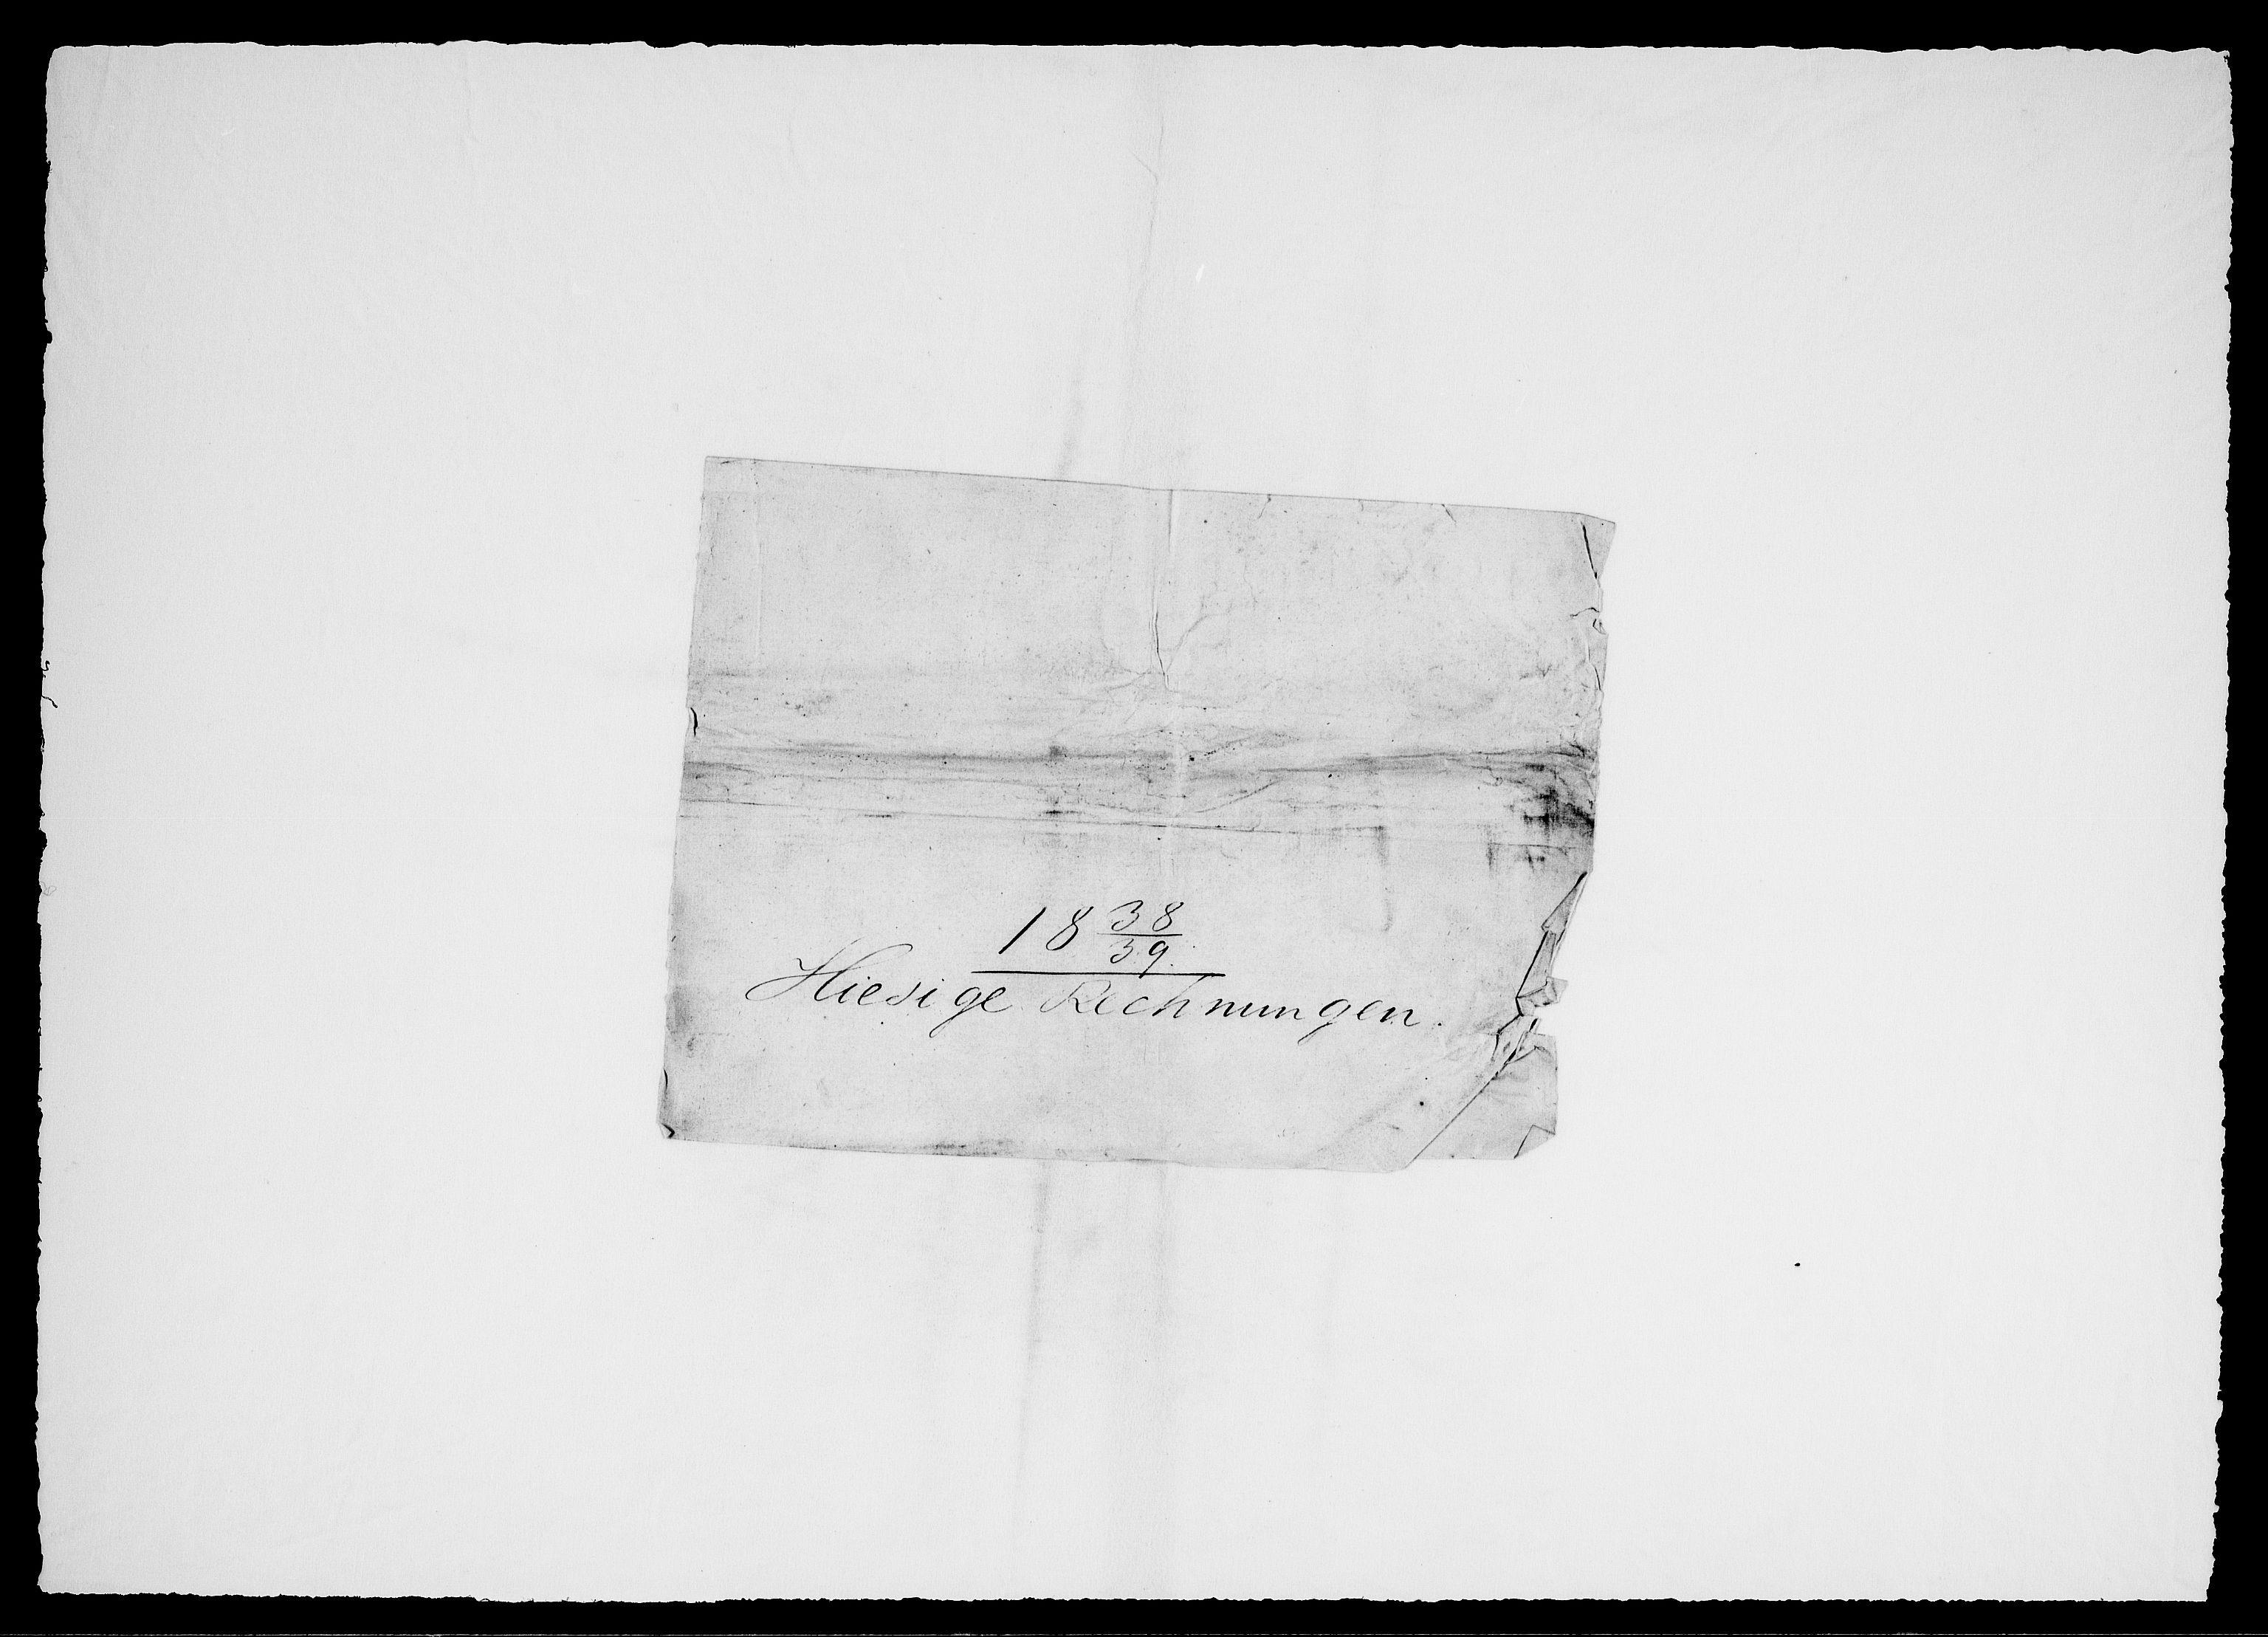 RA, Modums Blaafarveværk, G/Gd/Gdc/L0219, 1838-1841, s. 2